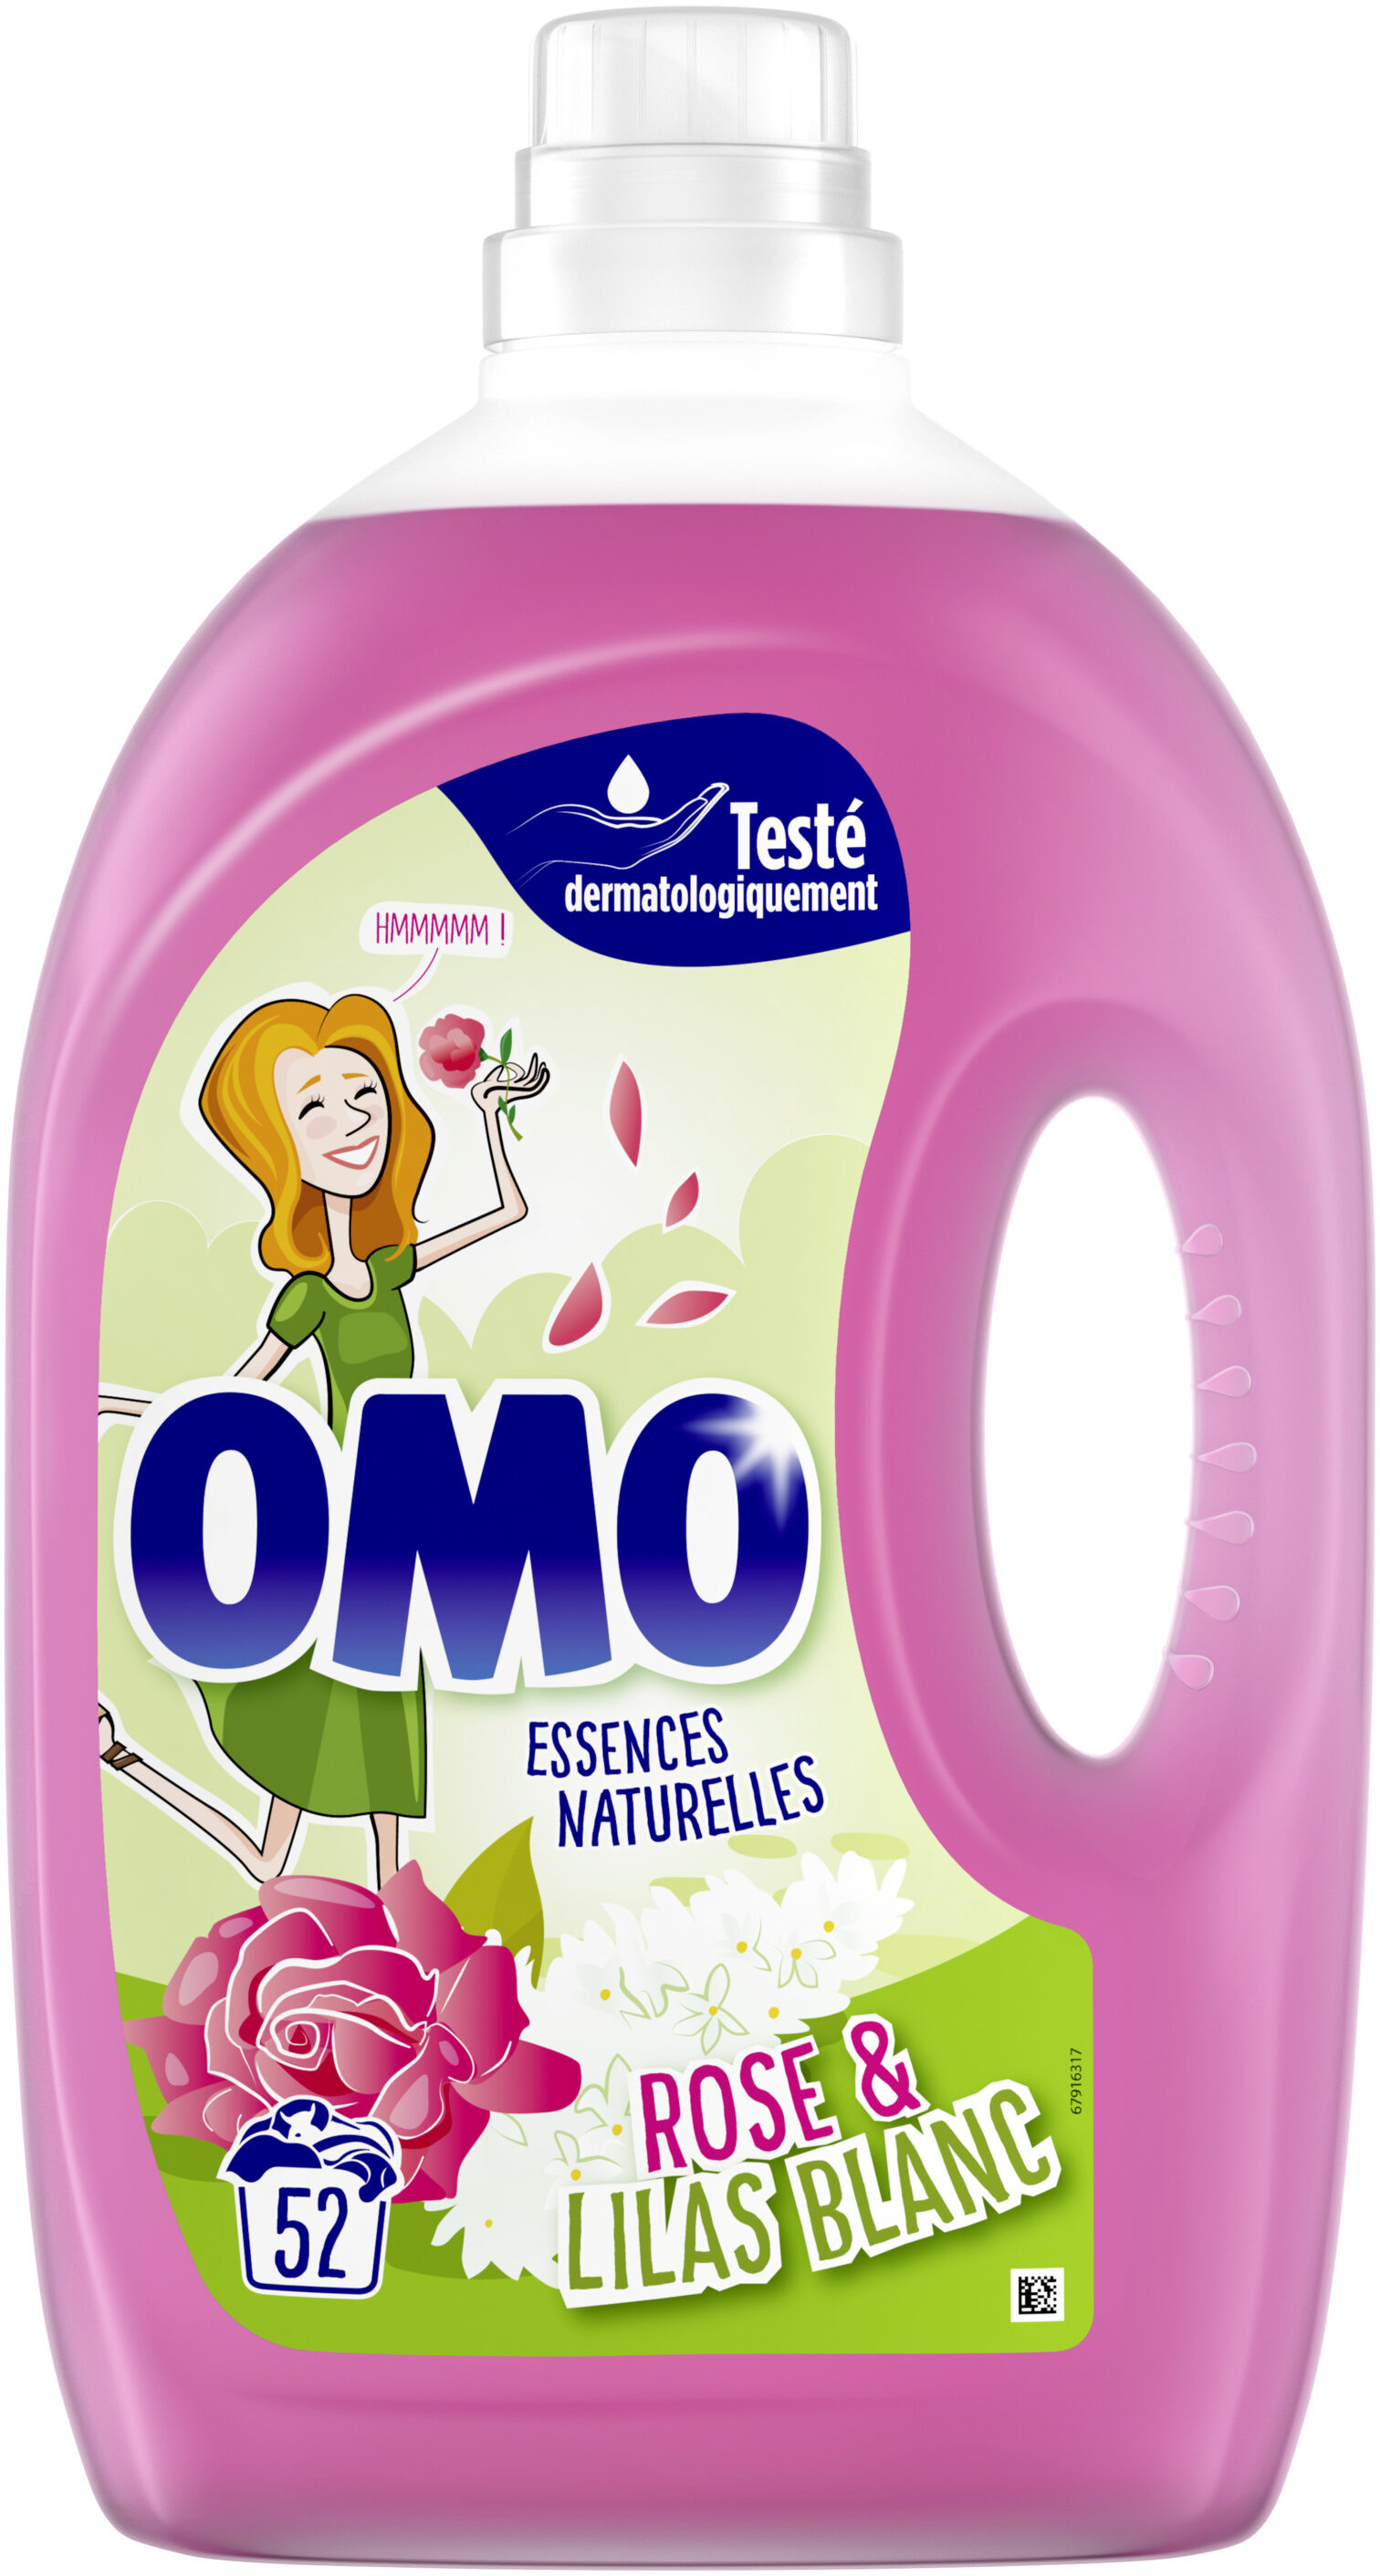 Omo Lessive Liquide Rose & Lilas Blanc 52 Lavages - 2,6l - Product - fr